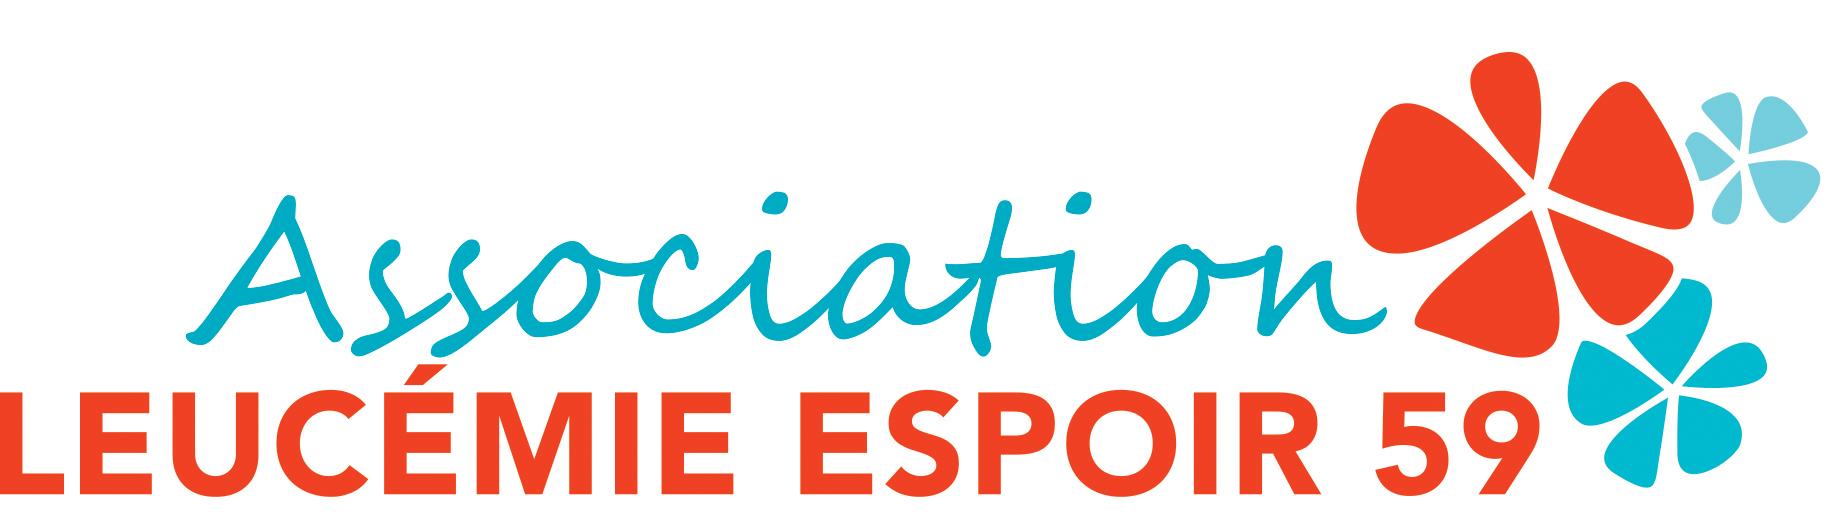 Association LEUCÉMIE ESPOIR 59